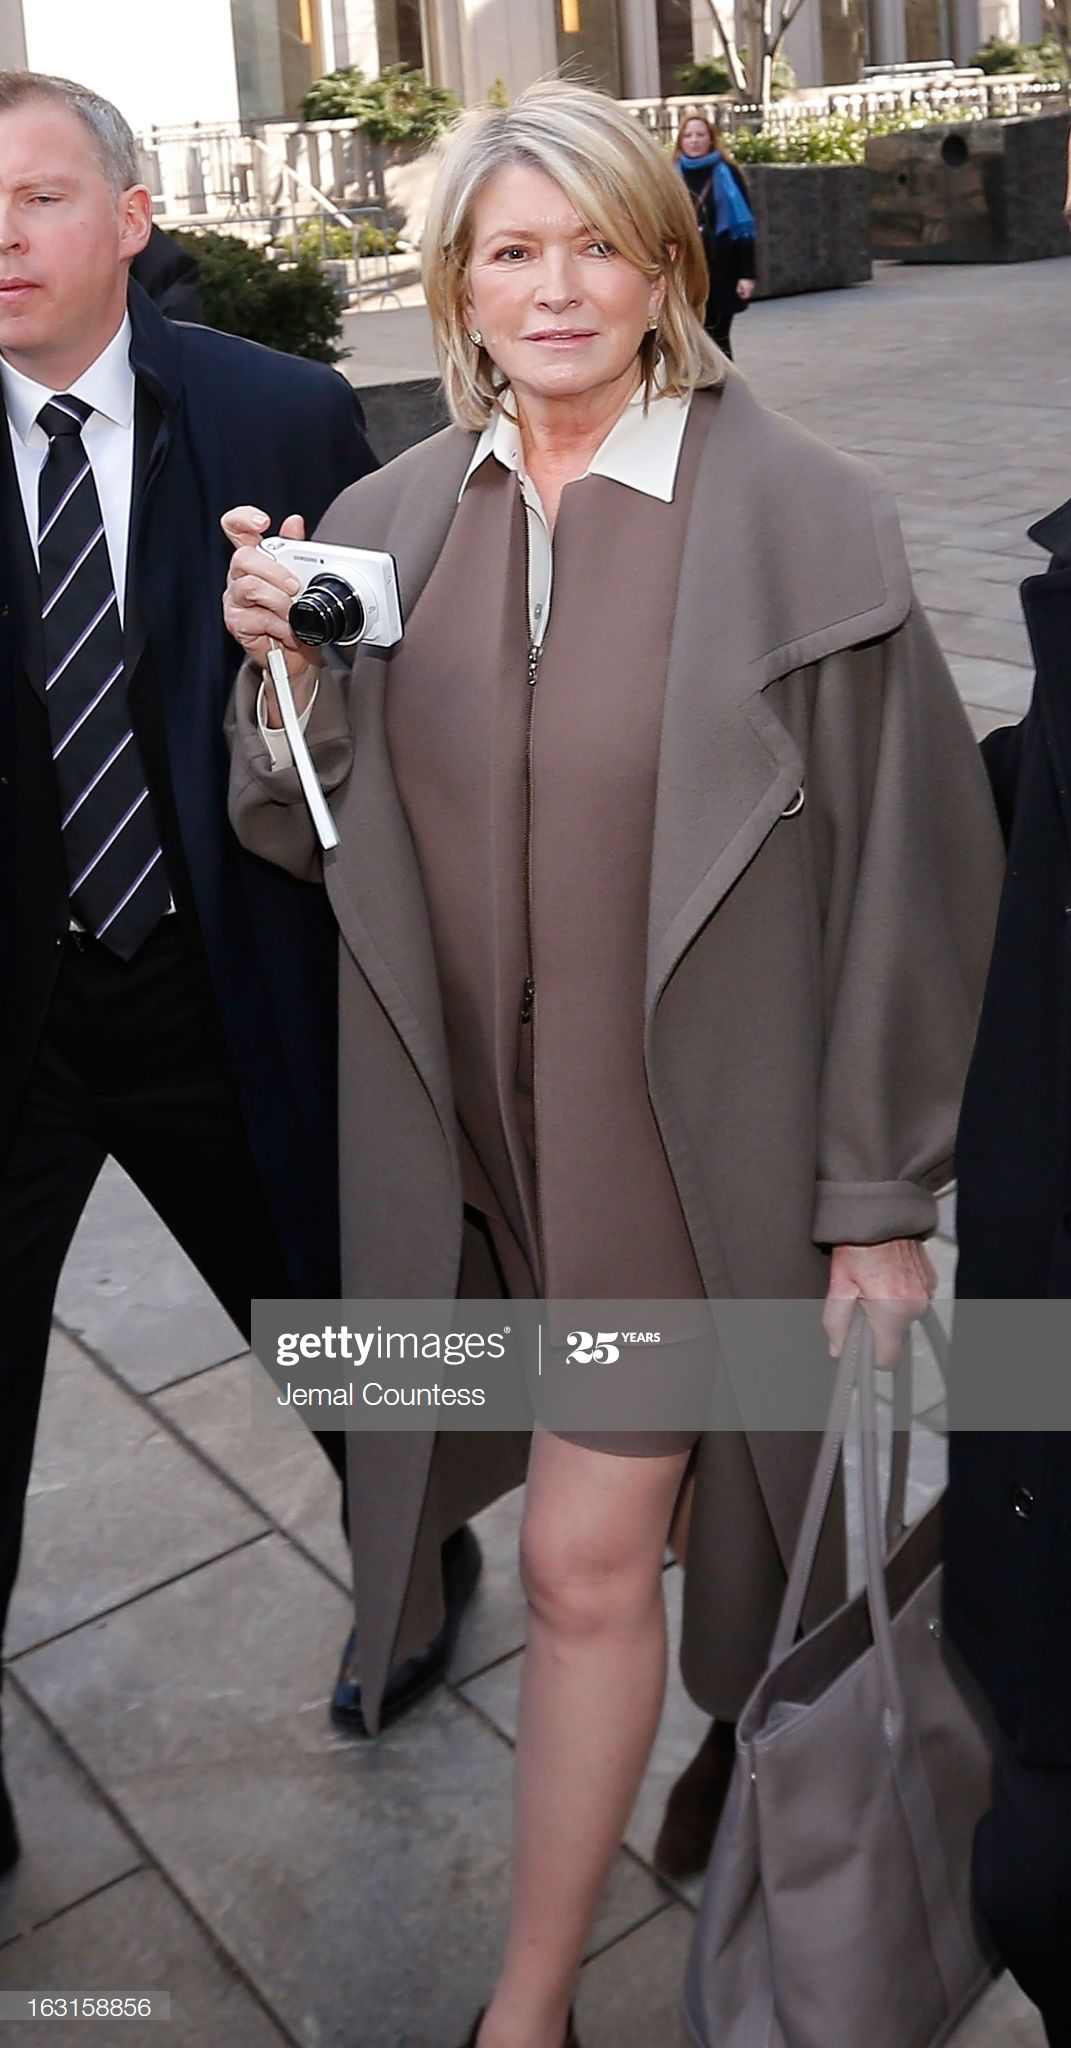 Pin on Celebrity Surgeries